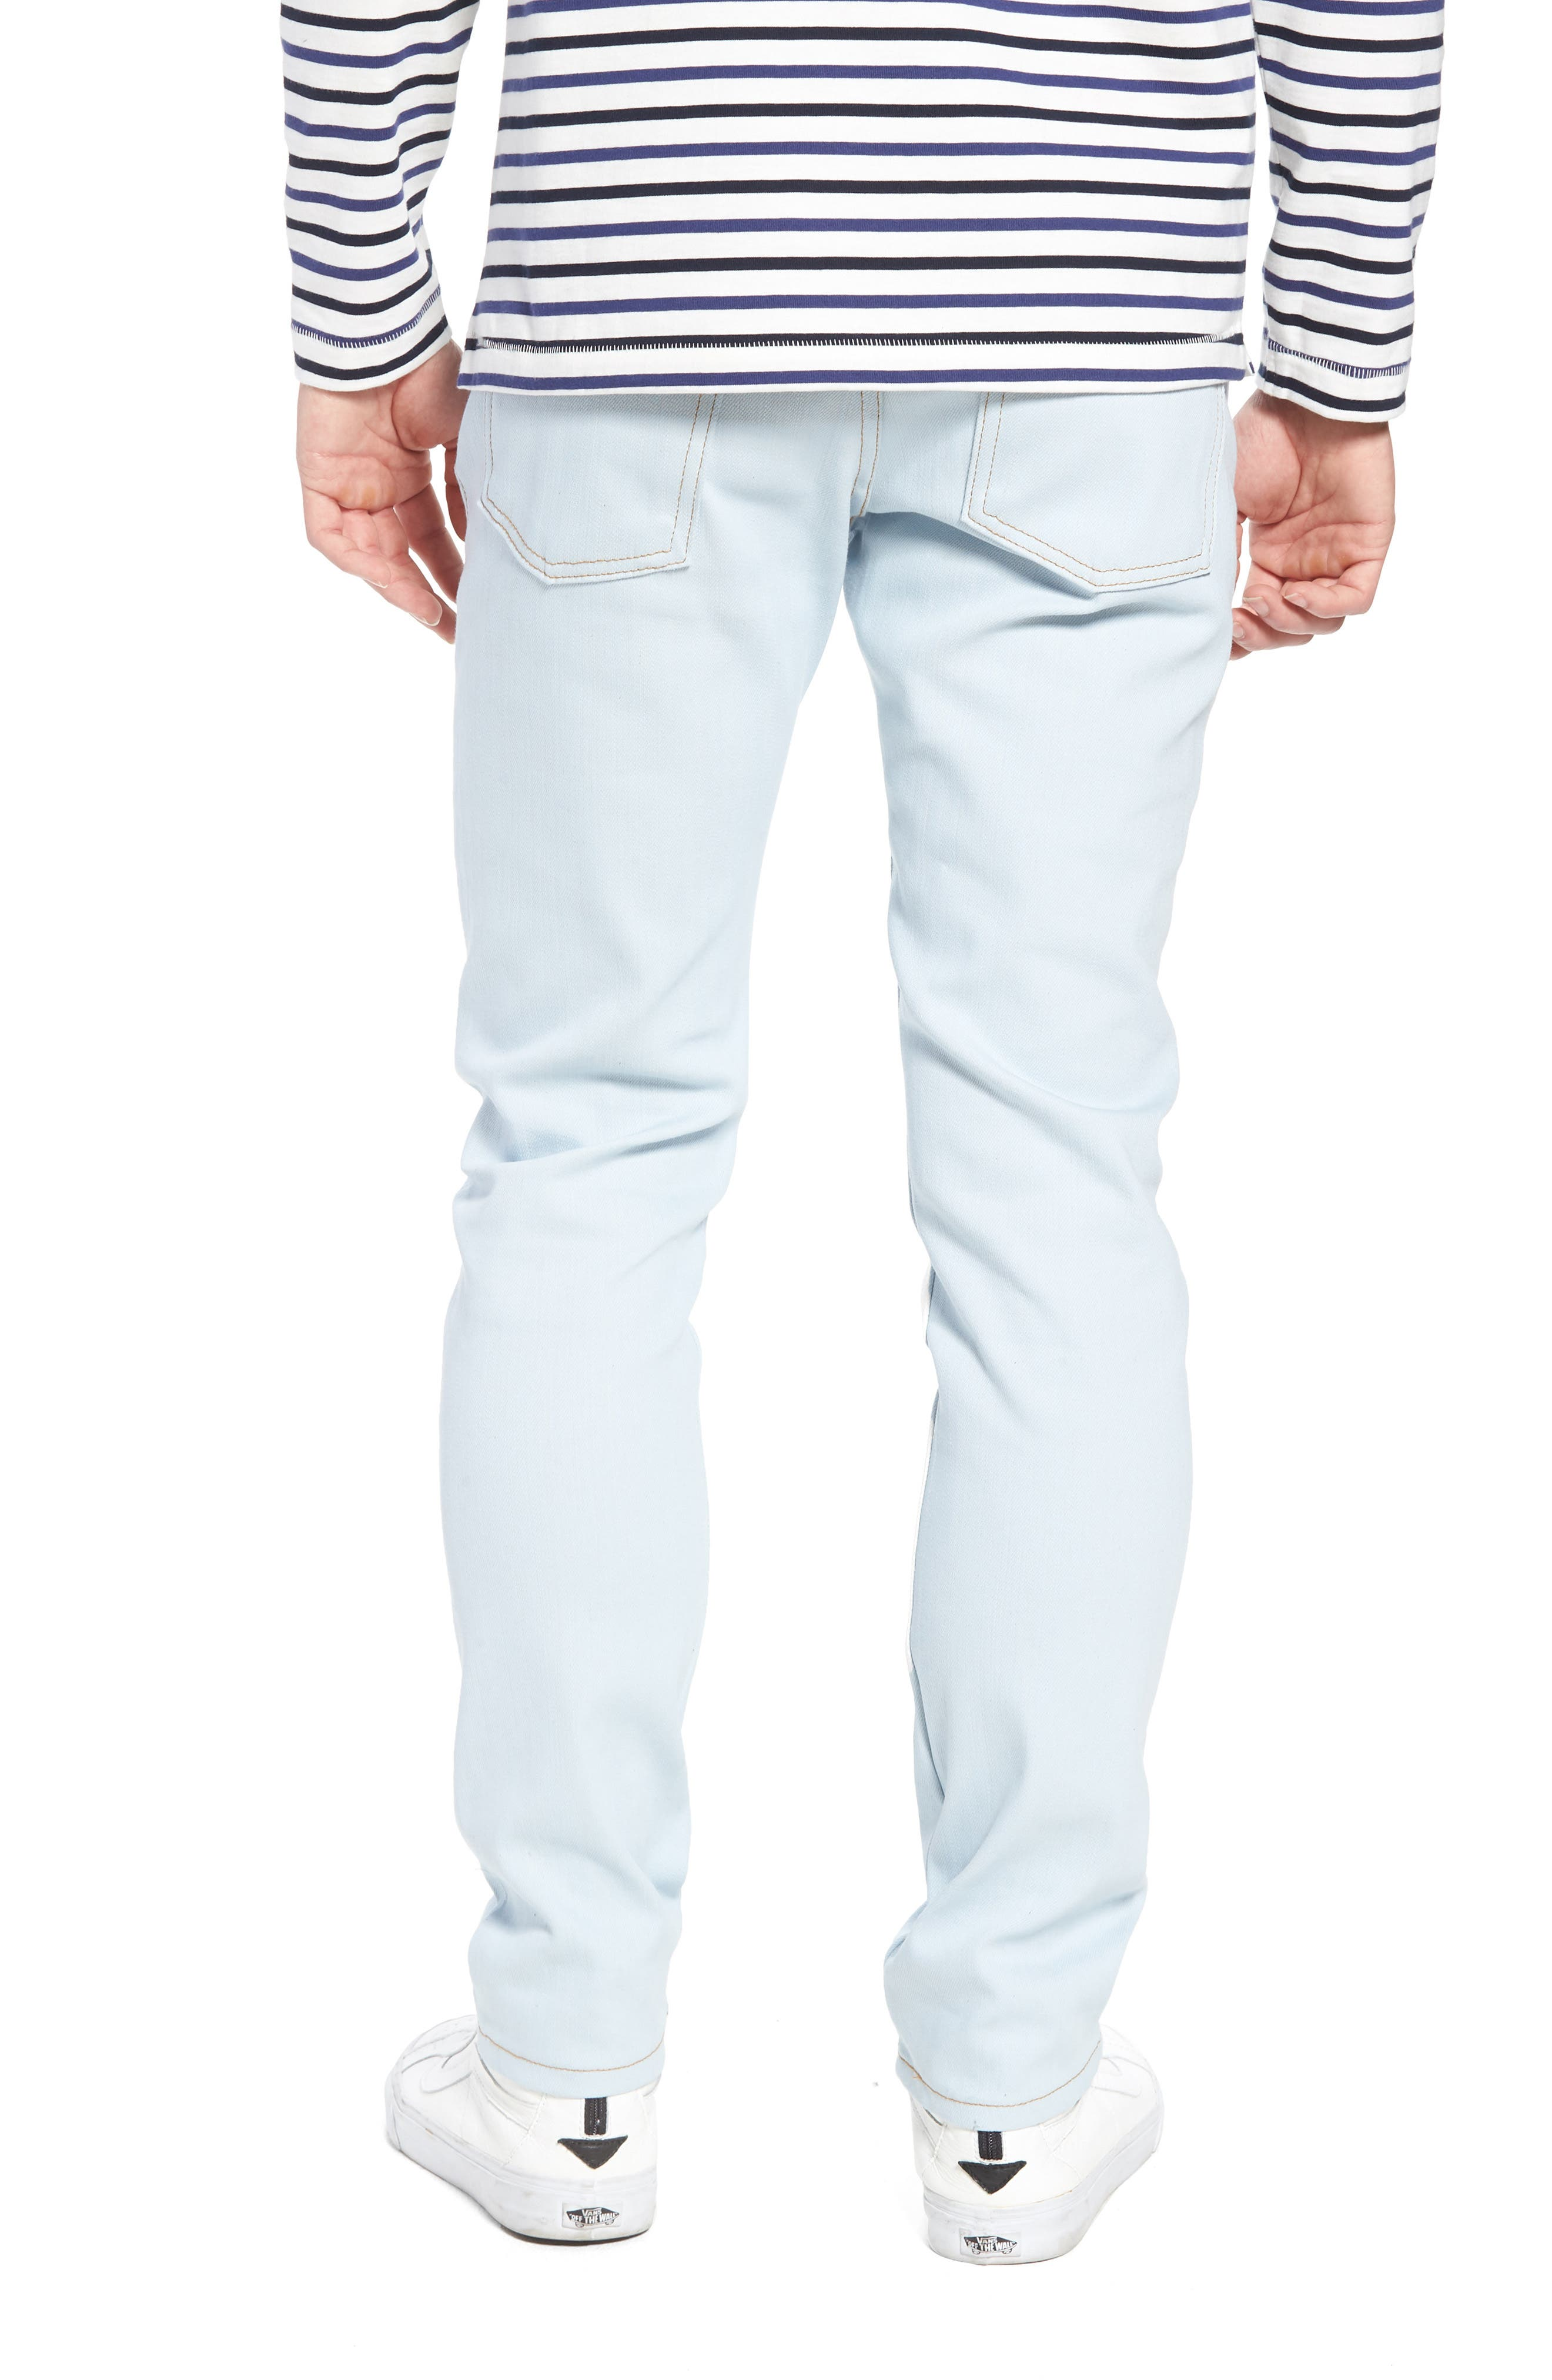 Naked & Famous Super Skinny Guy Skinny Fit Jeans,                             Alternate thumbnail 2, color,                             Powder Blue